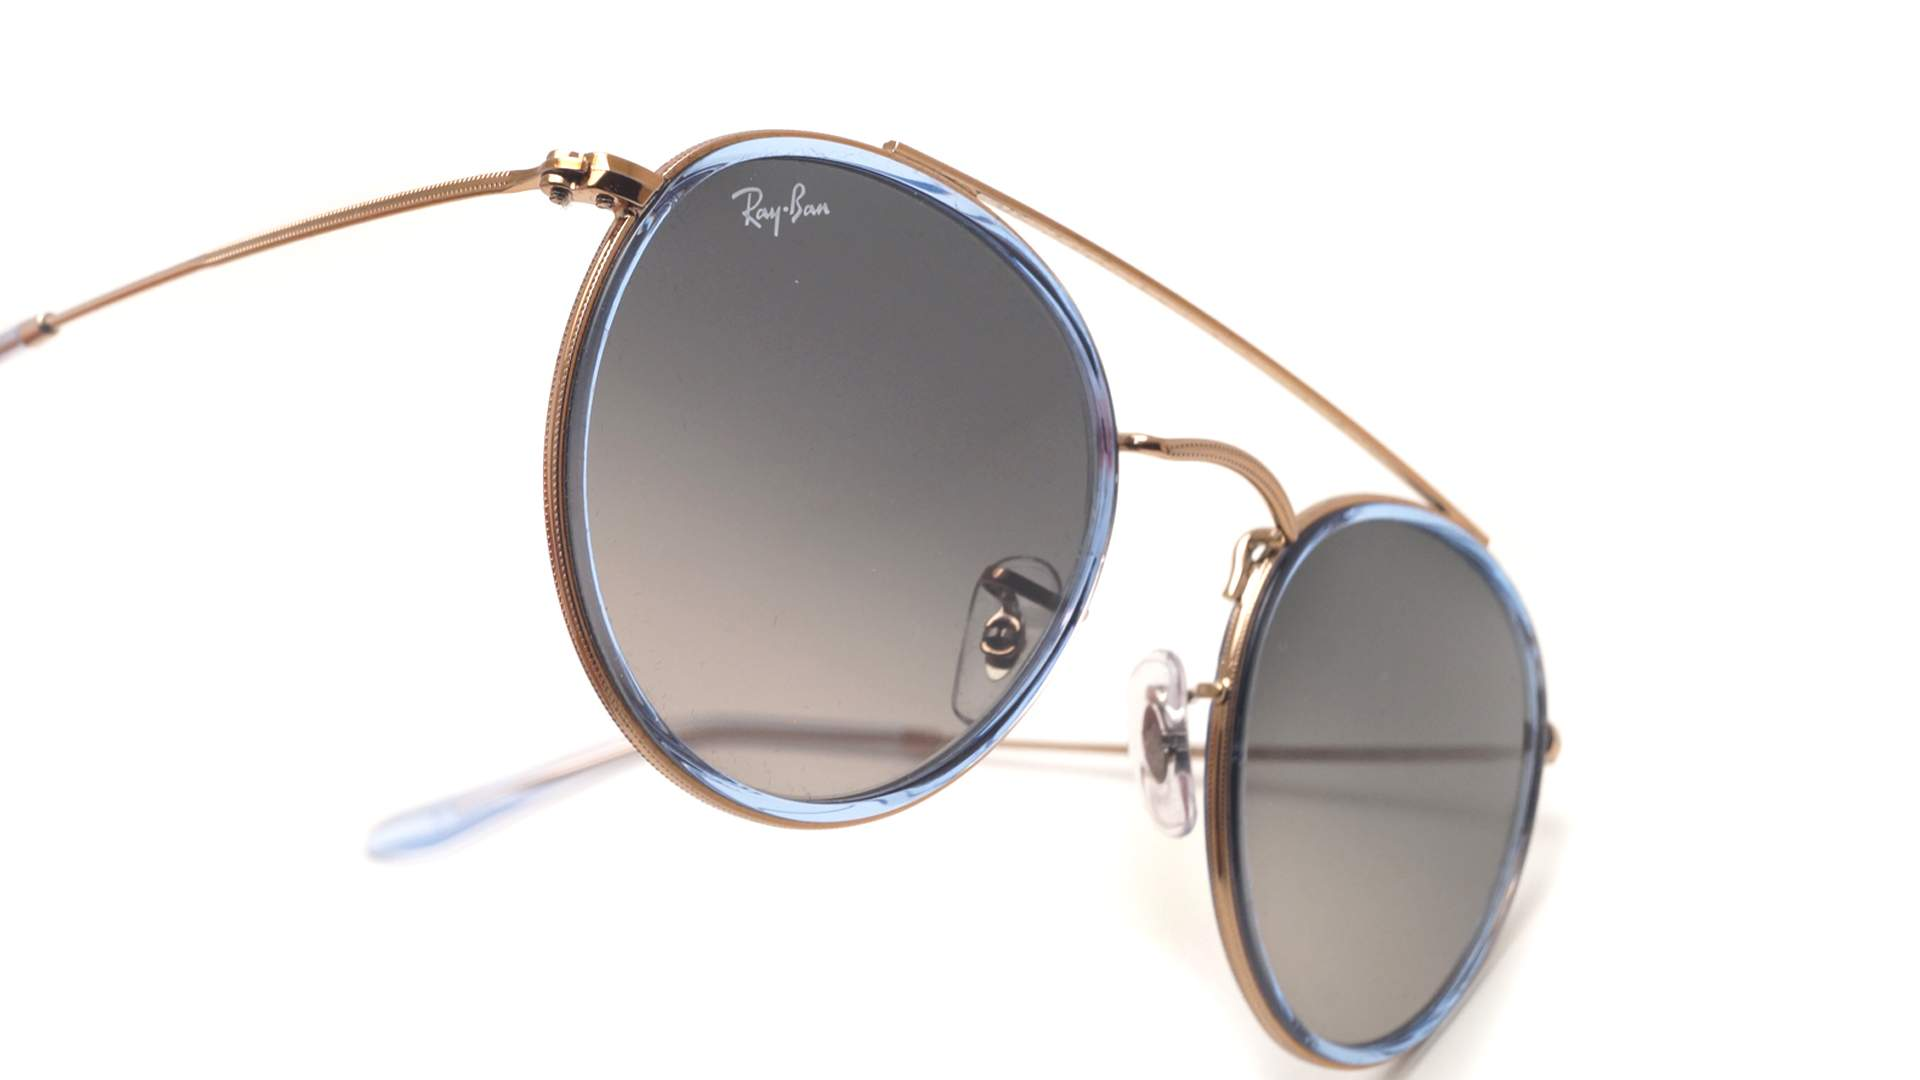 d7a8112f29 Sunglasses Ray-Ban Round Double Bridge Blue RB3647N 9067 71 51-22 Medium  Gradient